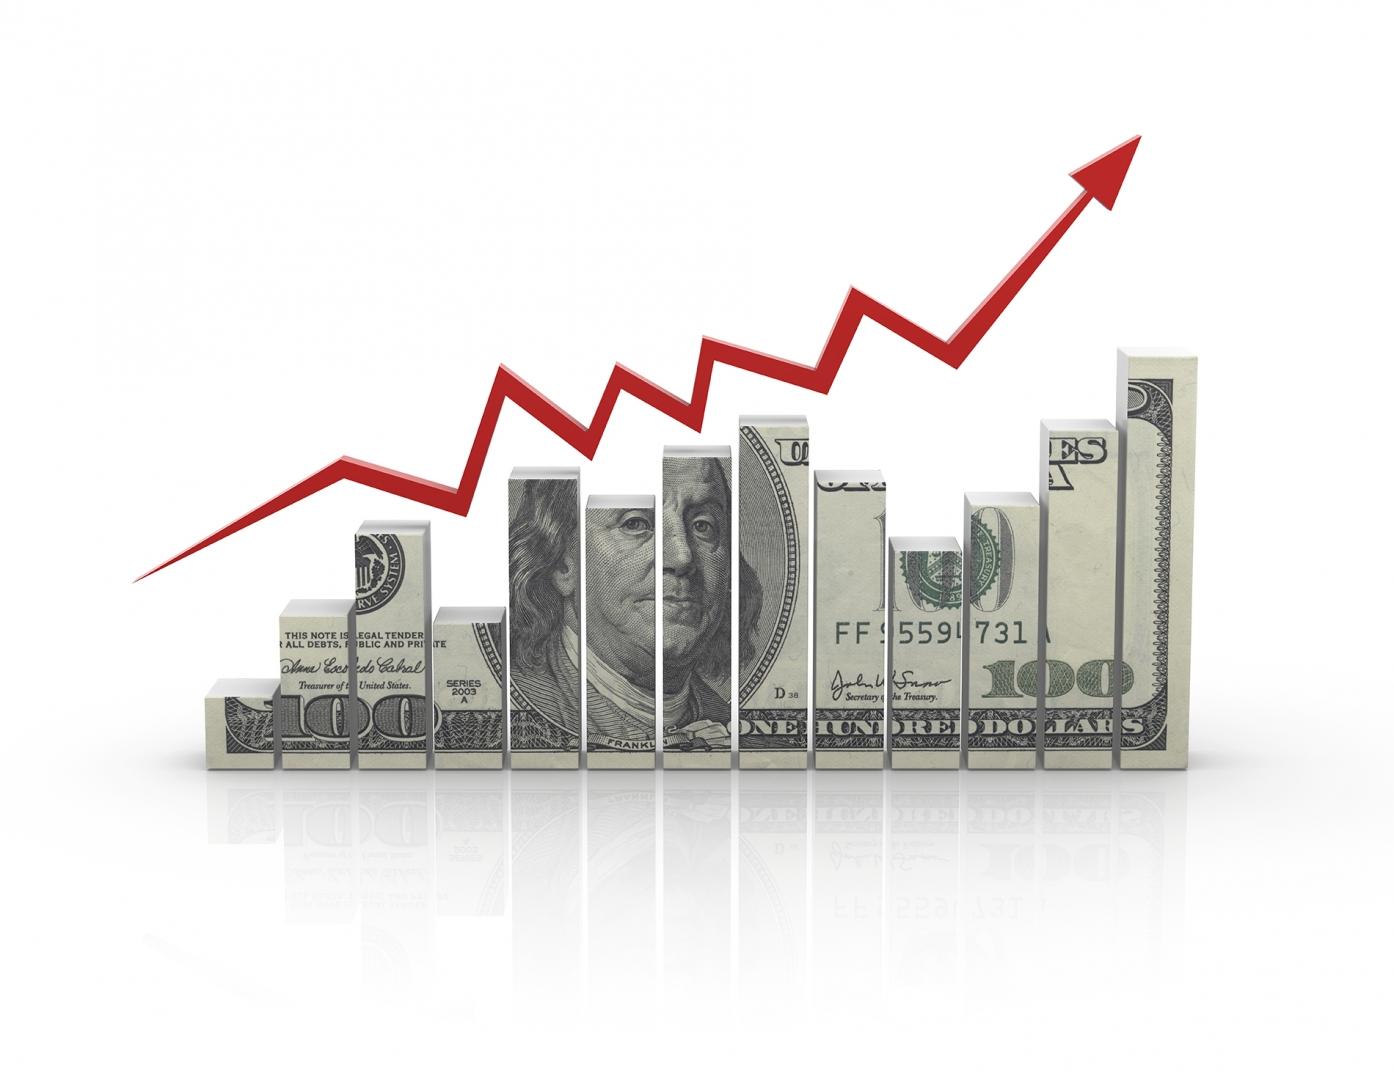 dollar bill represented as a growing bar chart